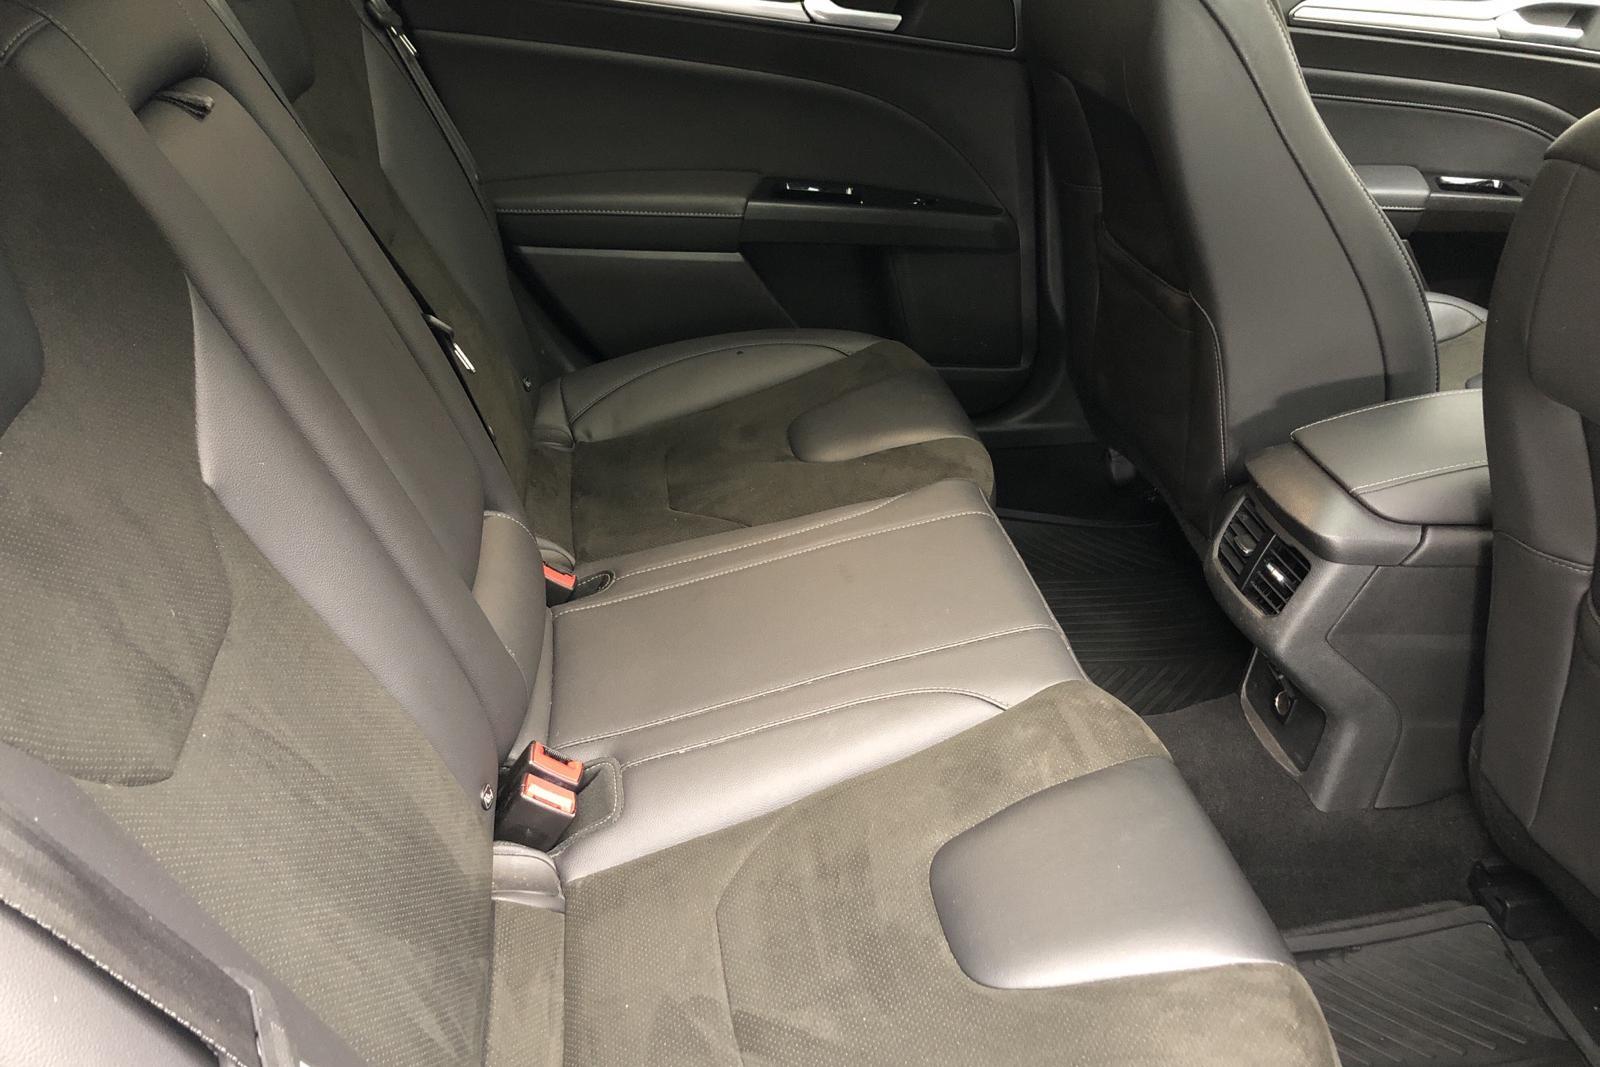 Ford Mondeo 2.0 TDCi AWD Kombi (180hk) - 13 412 mil - Automat - vit - 2017